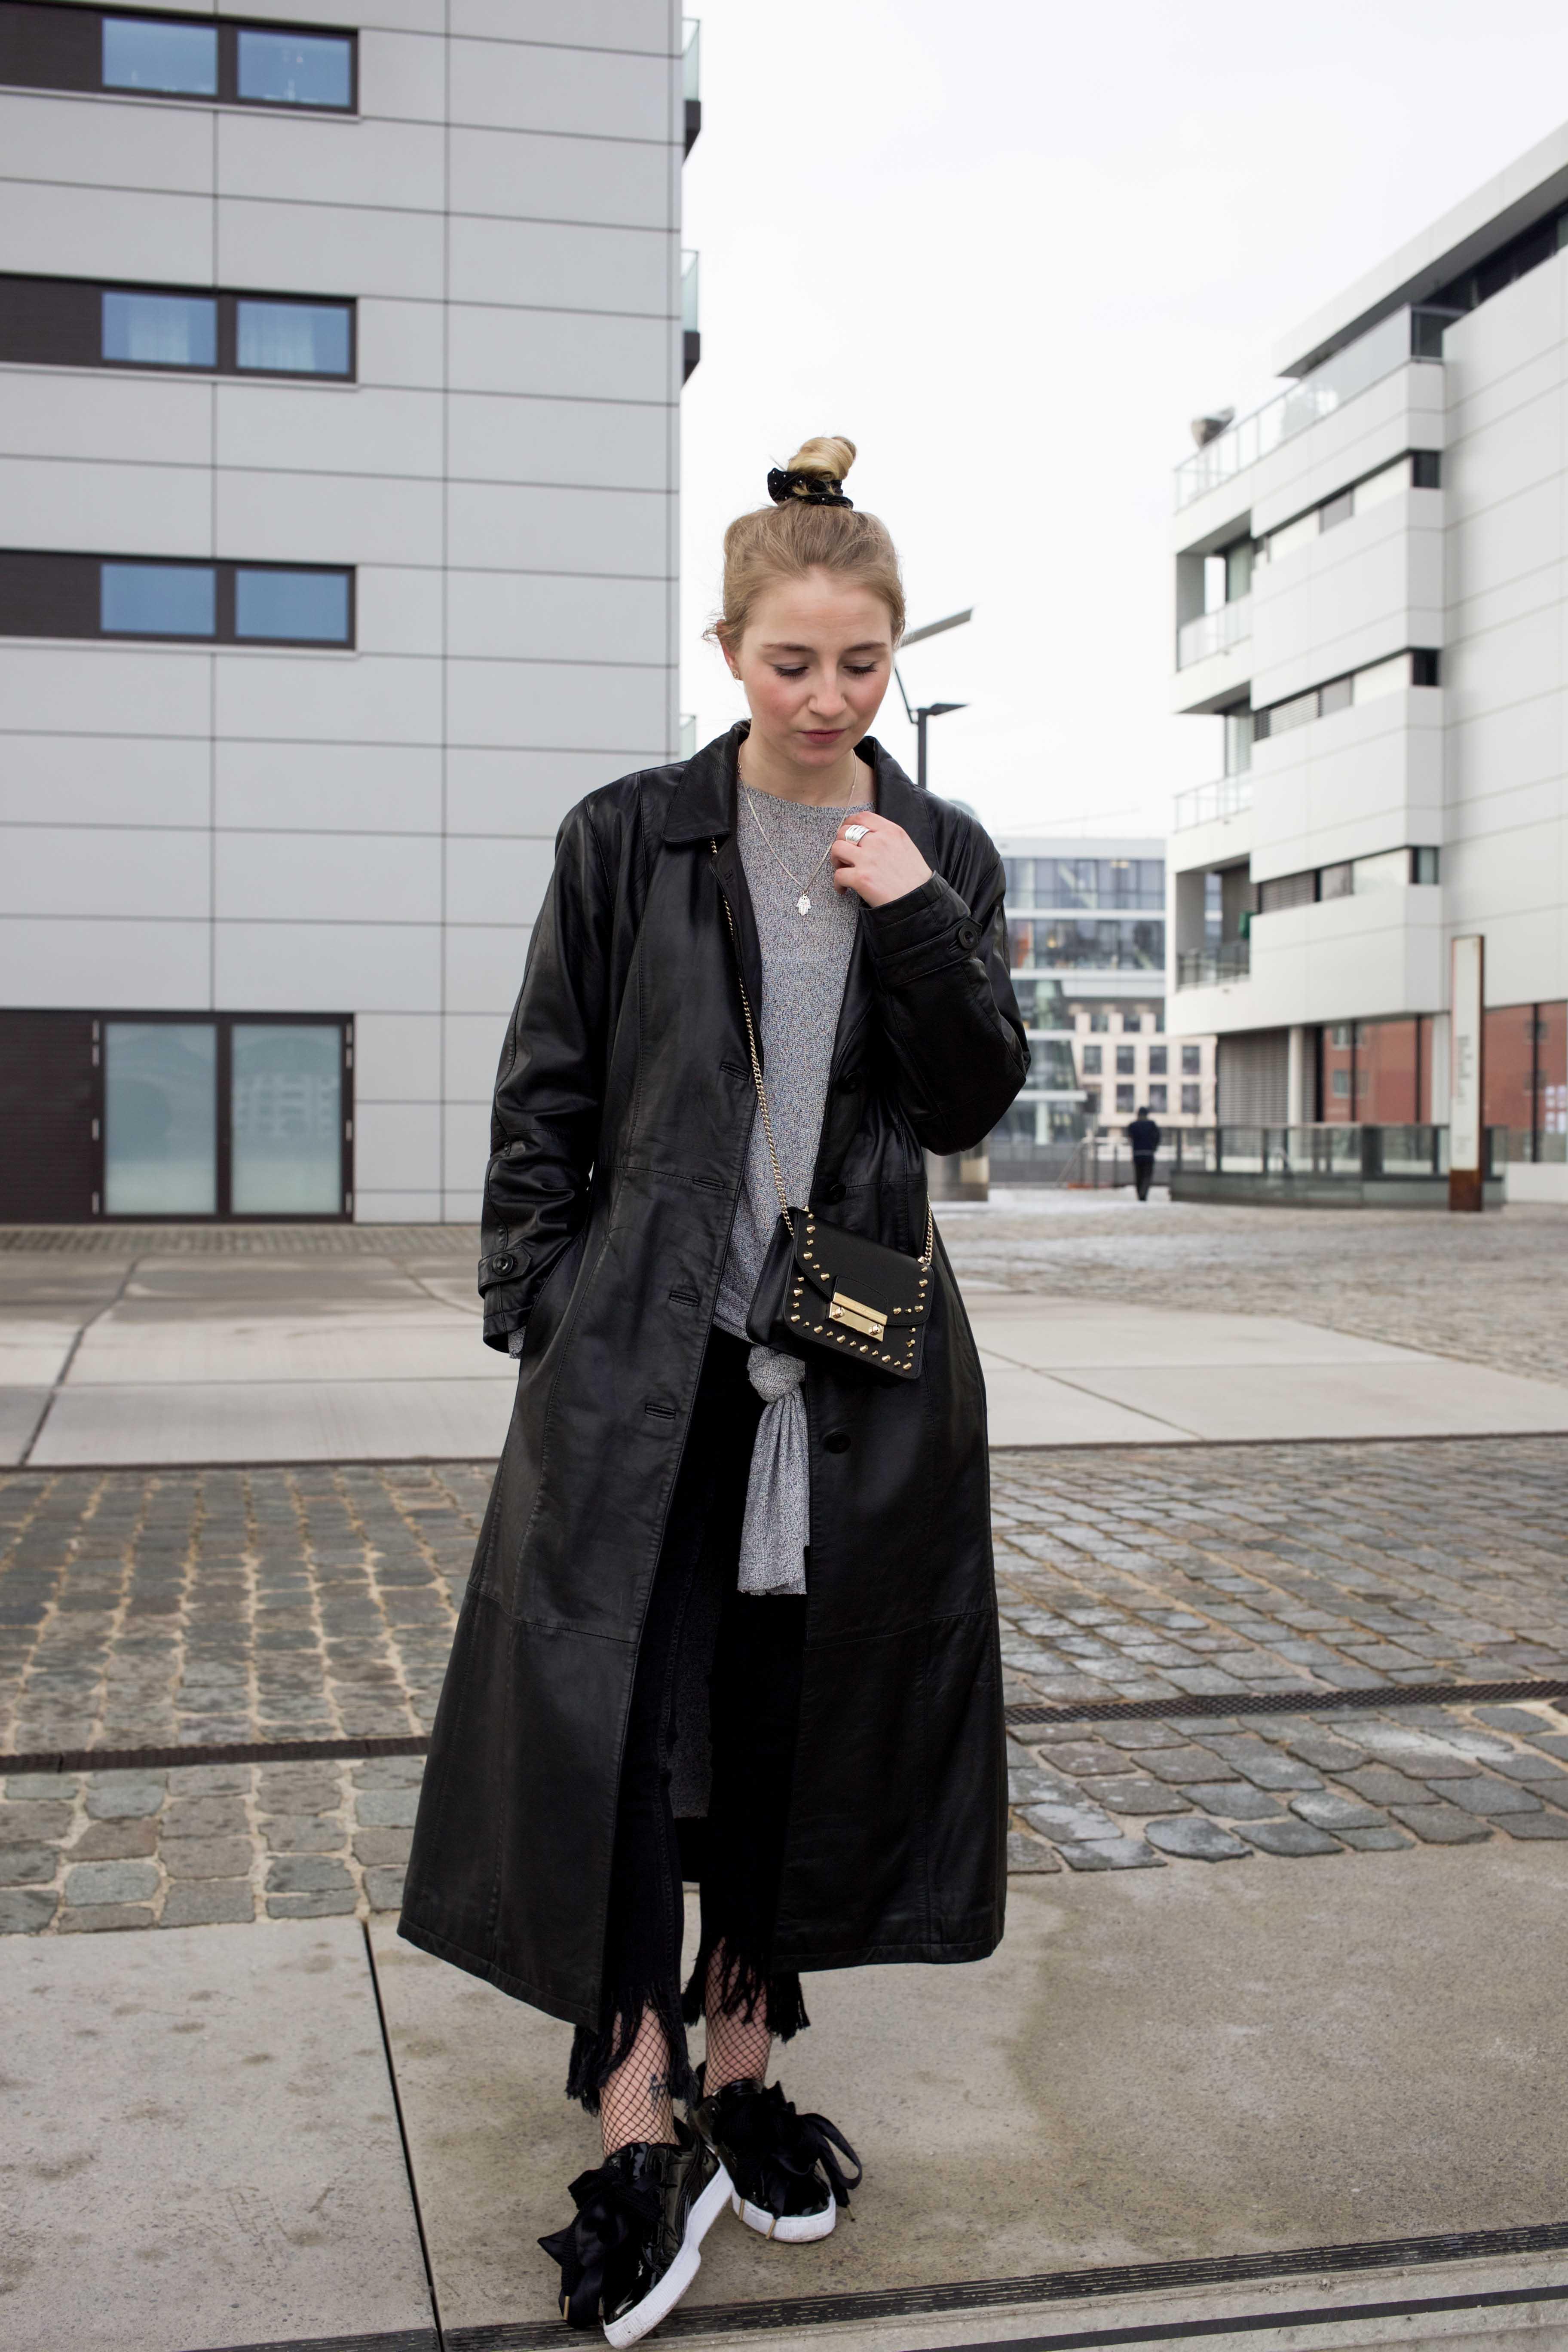 Netzstrumpfhose-kombinieren-Trend-Outfit-Fashionblog-PUMA-Basket-Ledermantel_9432